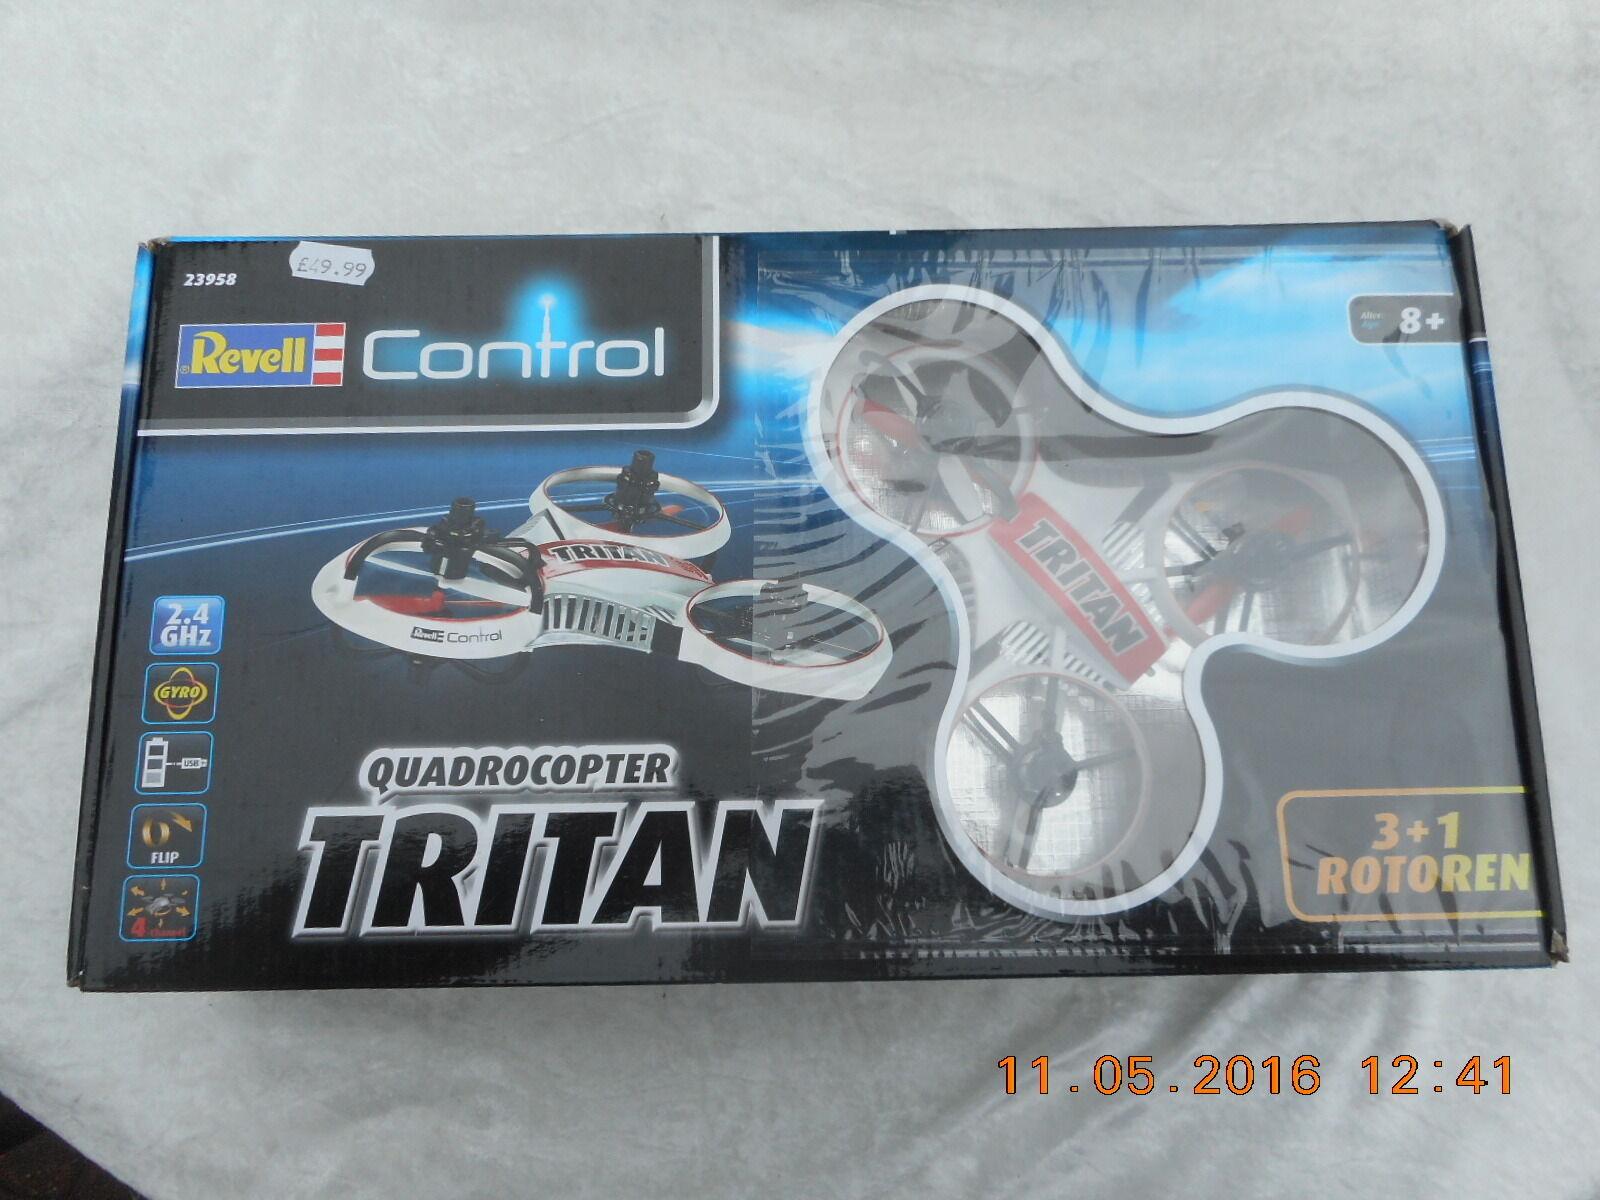 REVELL CONTROL QUADROCOPTER TRITAN (23958)